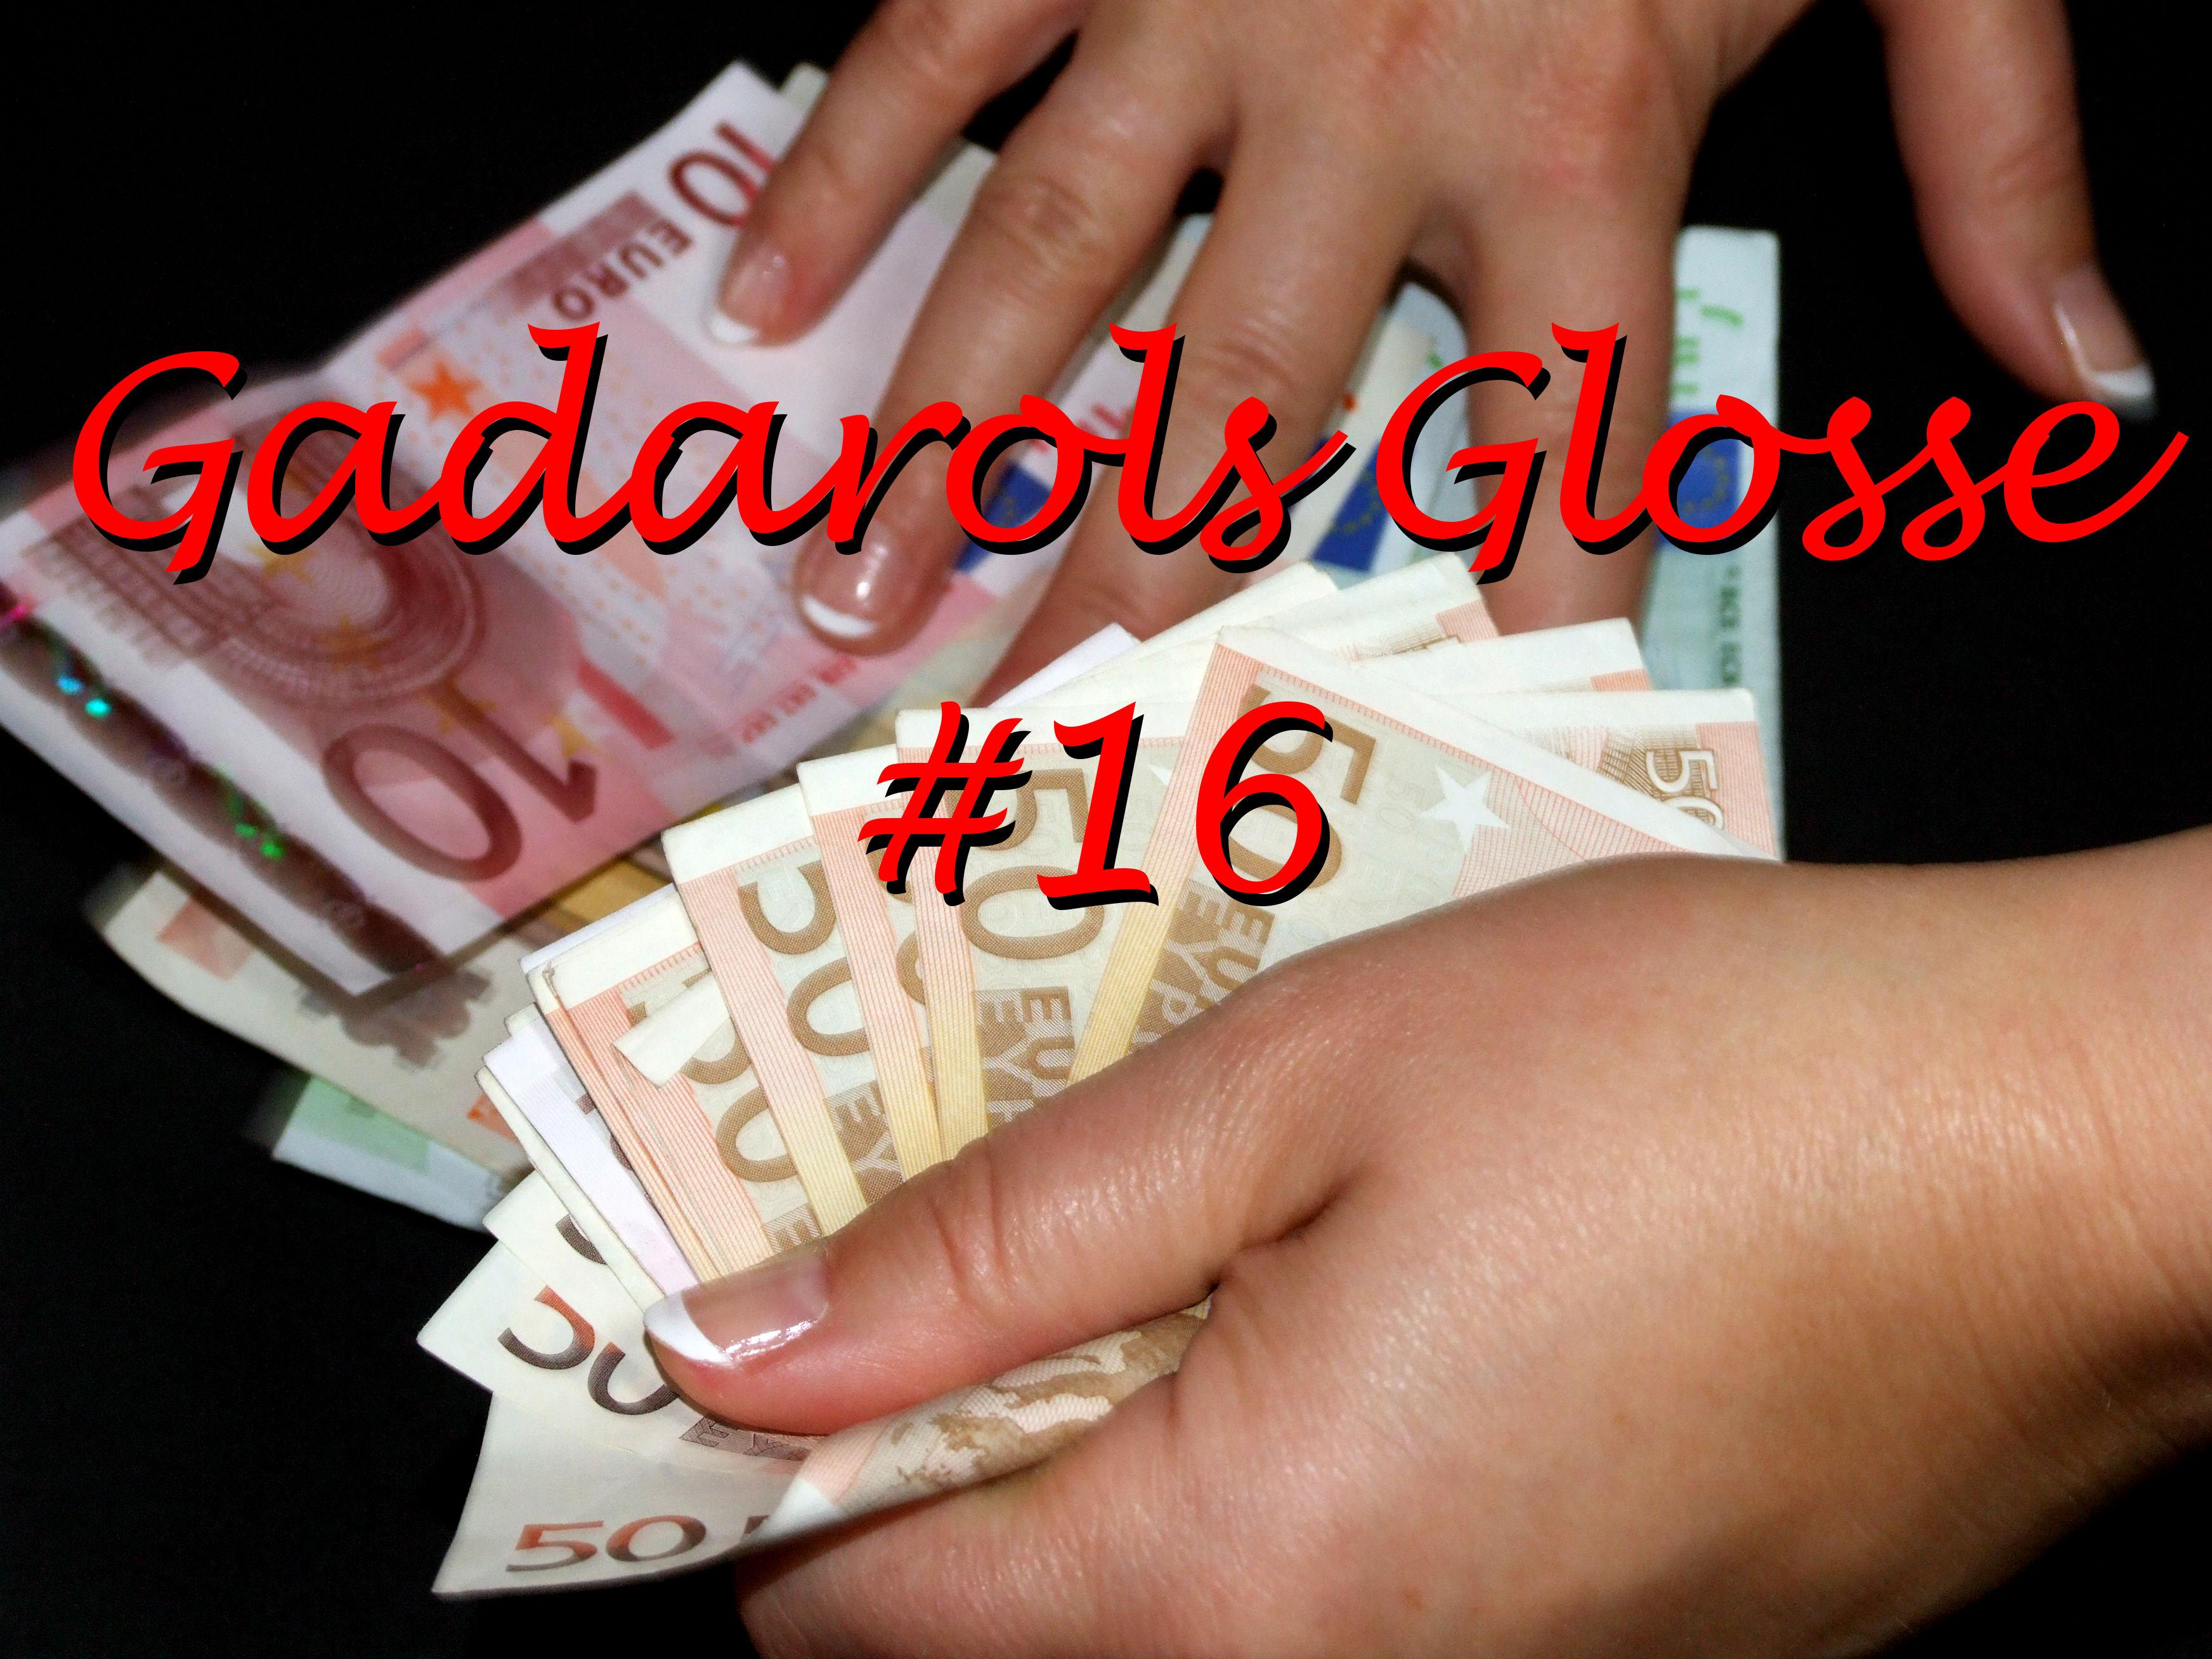 GadarolsGlosse16